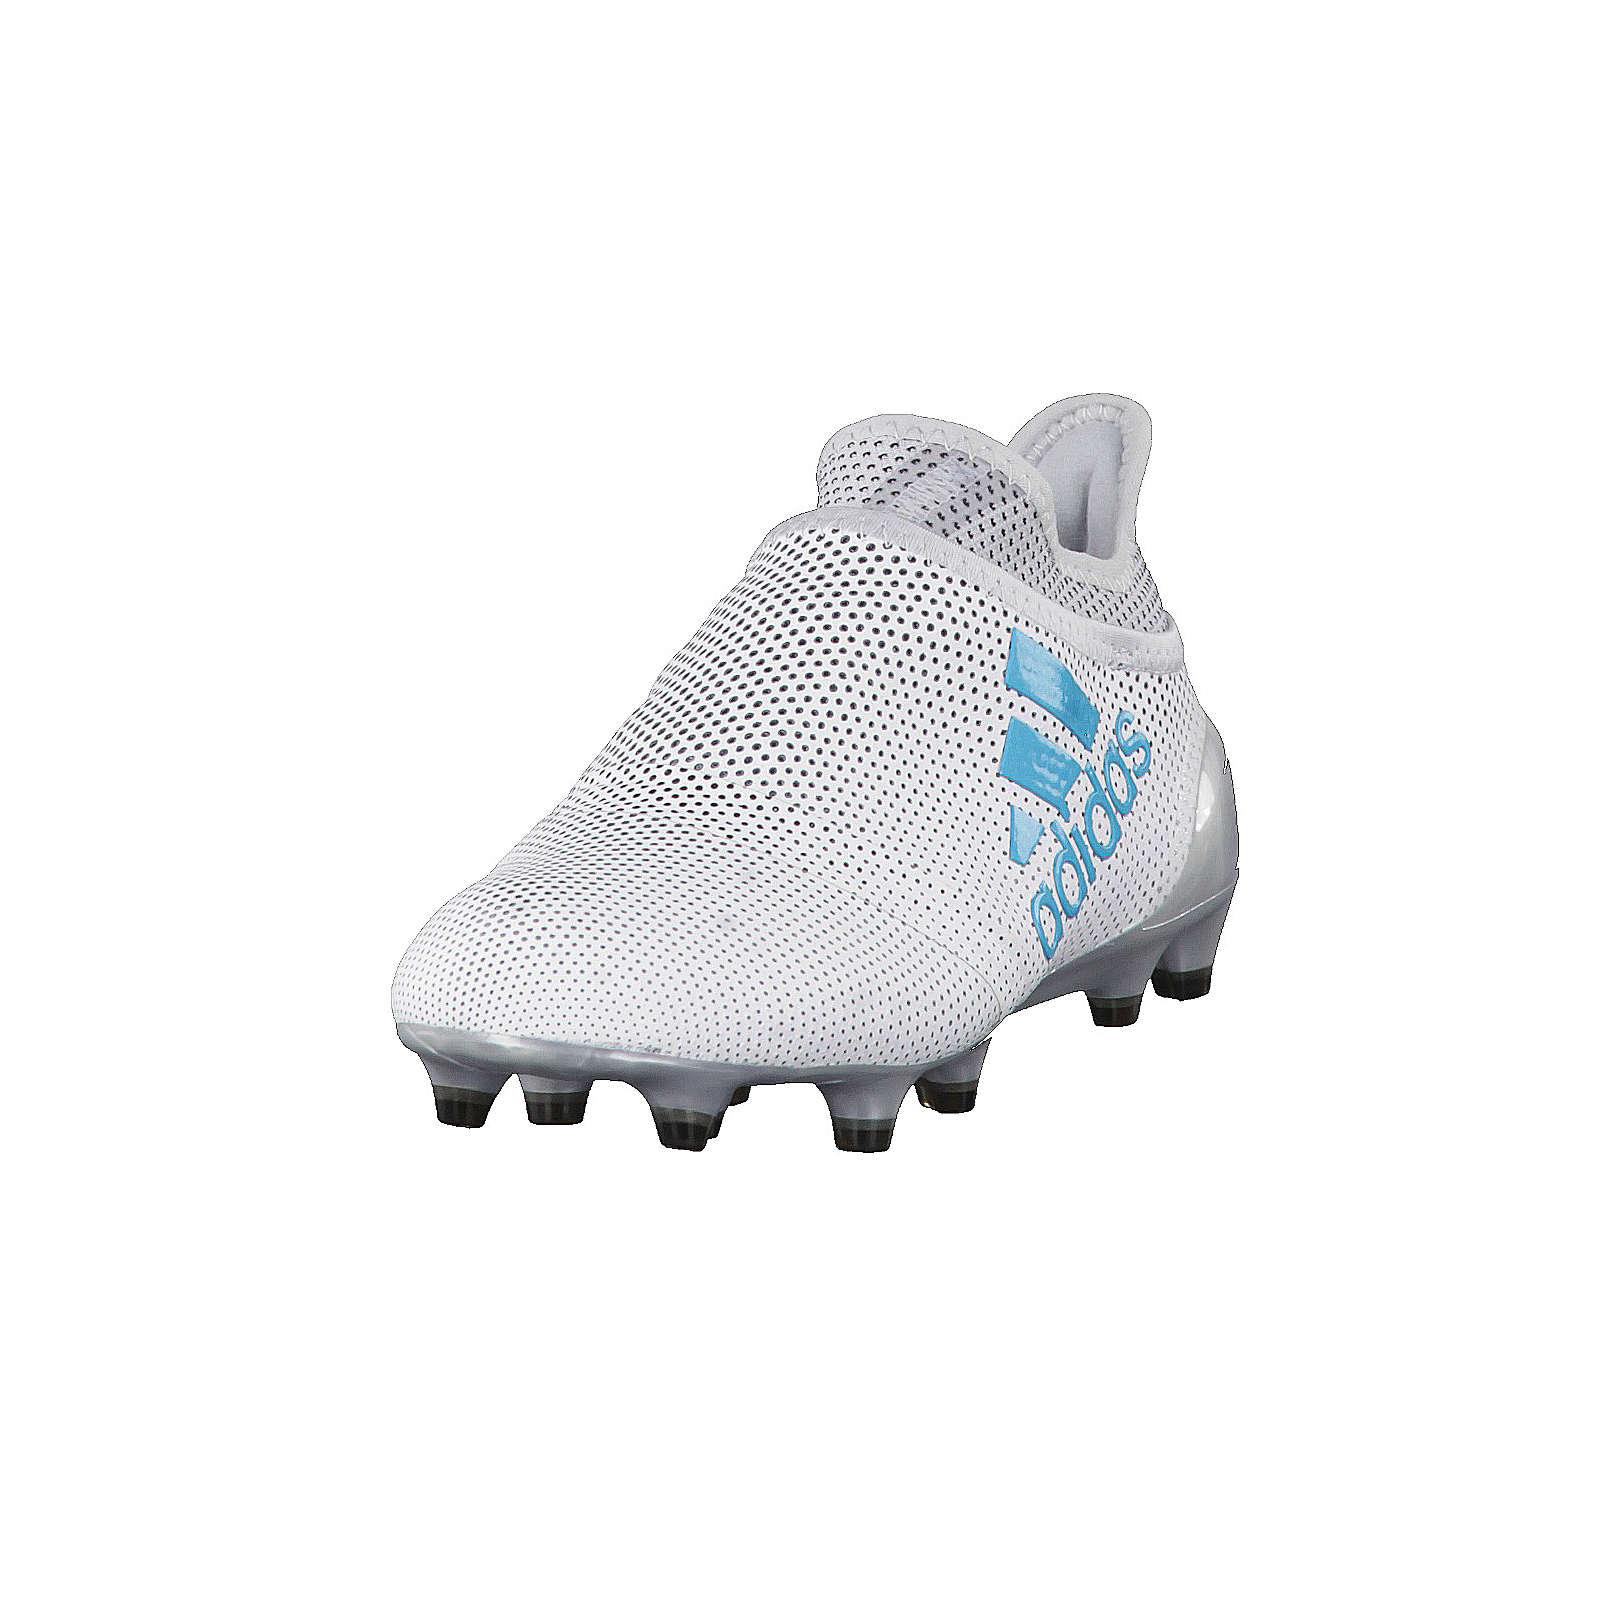 adidas Performance Kinder Fußballschuhe X 17+ PURESPEED Gr. 37 1/3 jetztbilligerkaufen